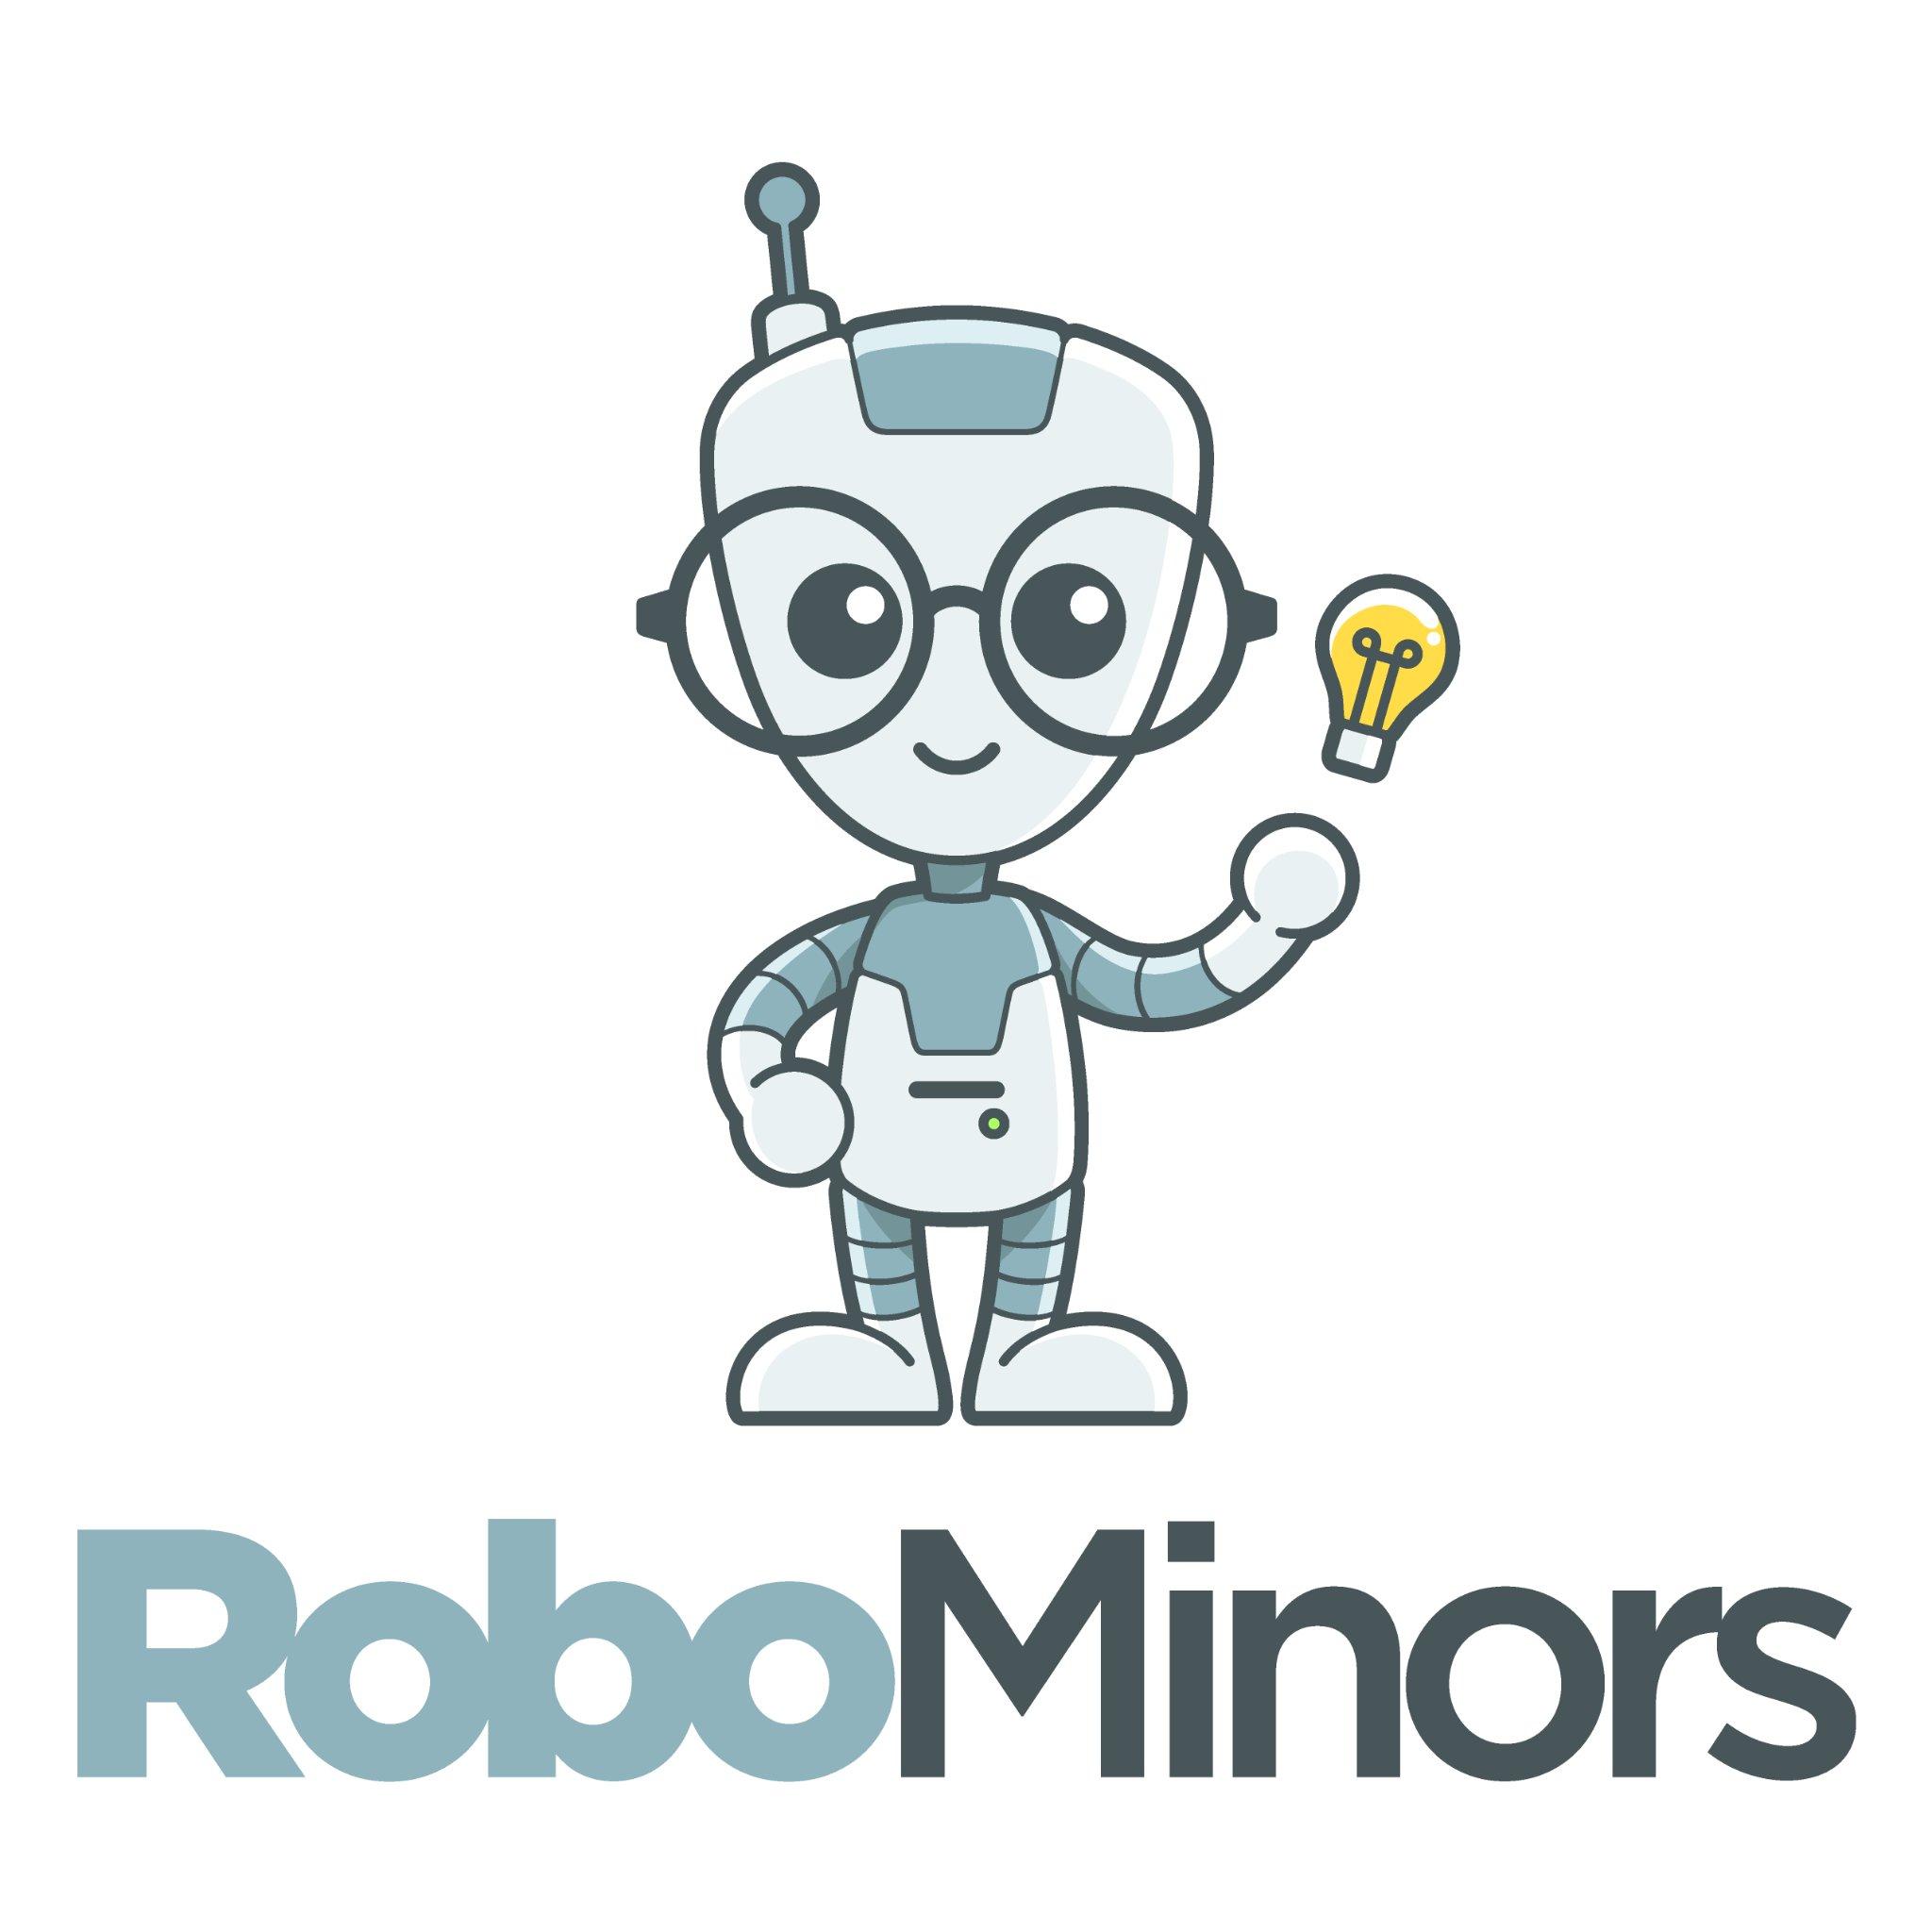 @RoboMinors